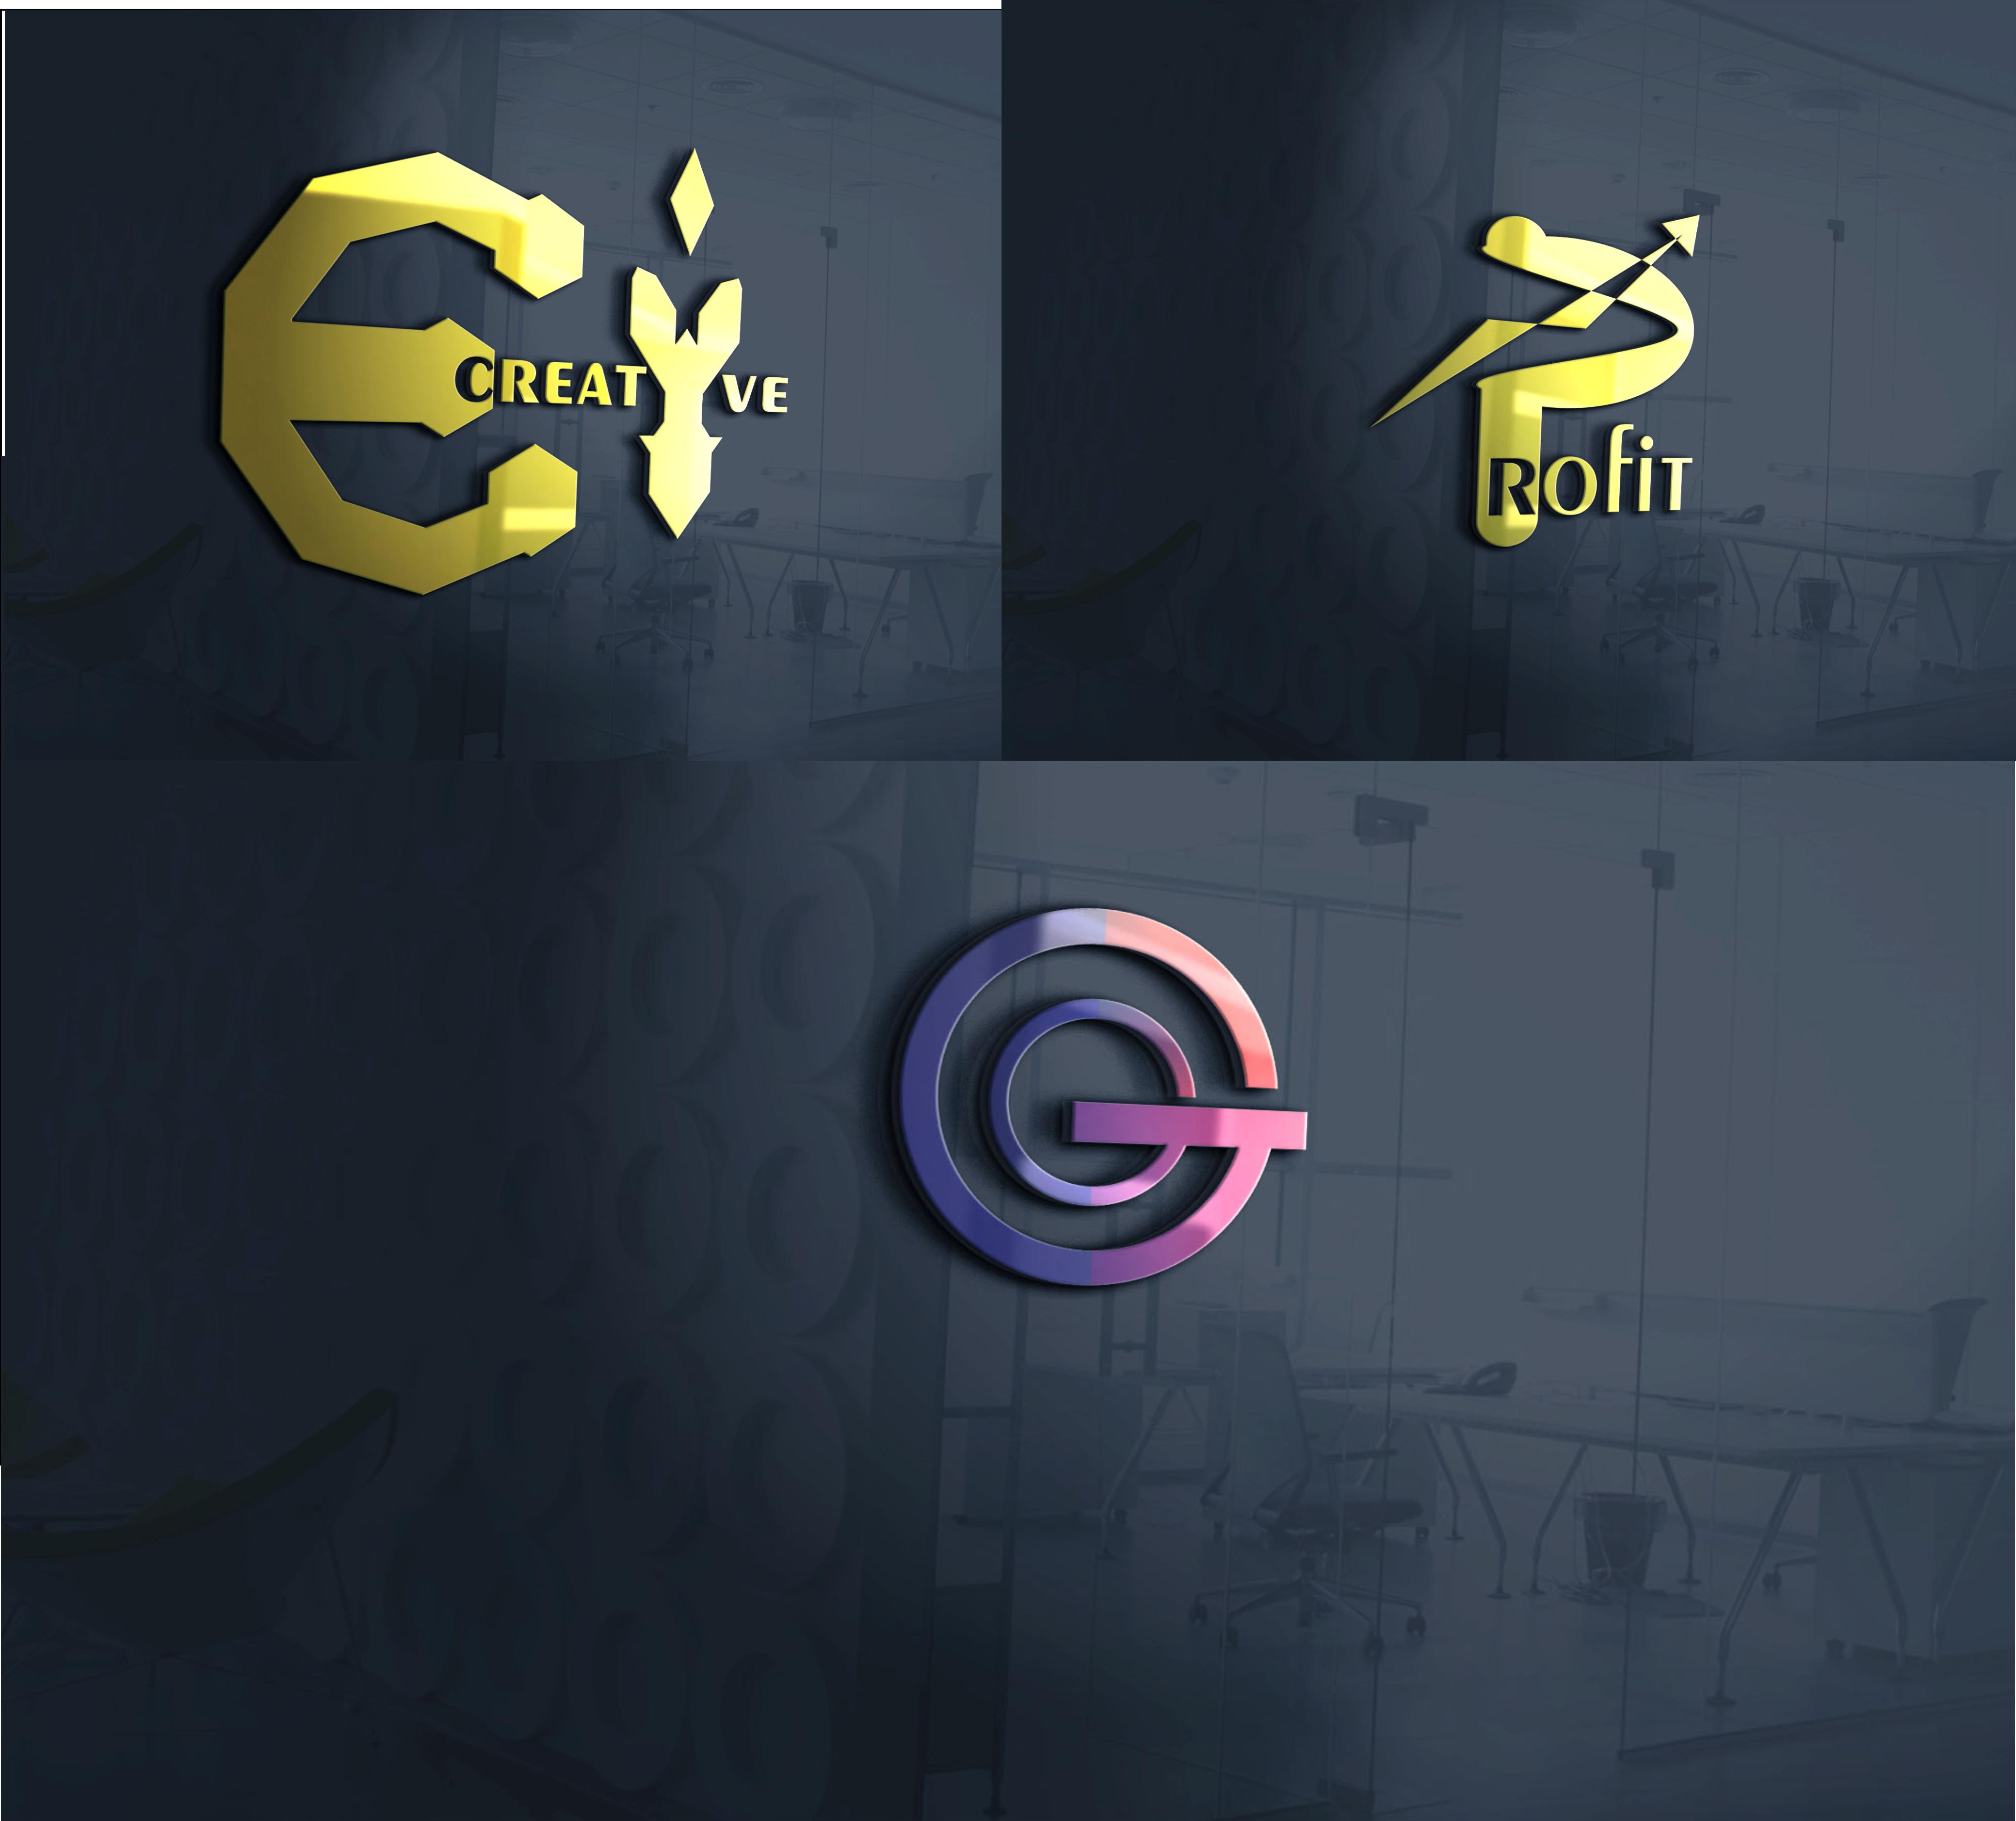 I will make 3 elegant logos for you